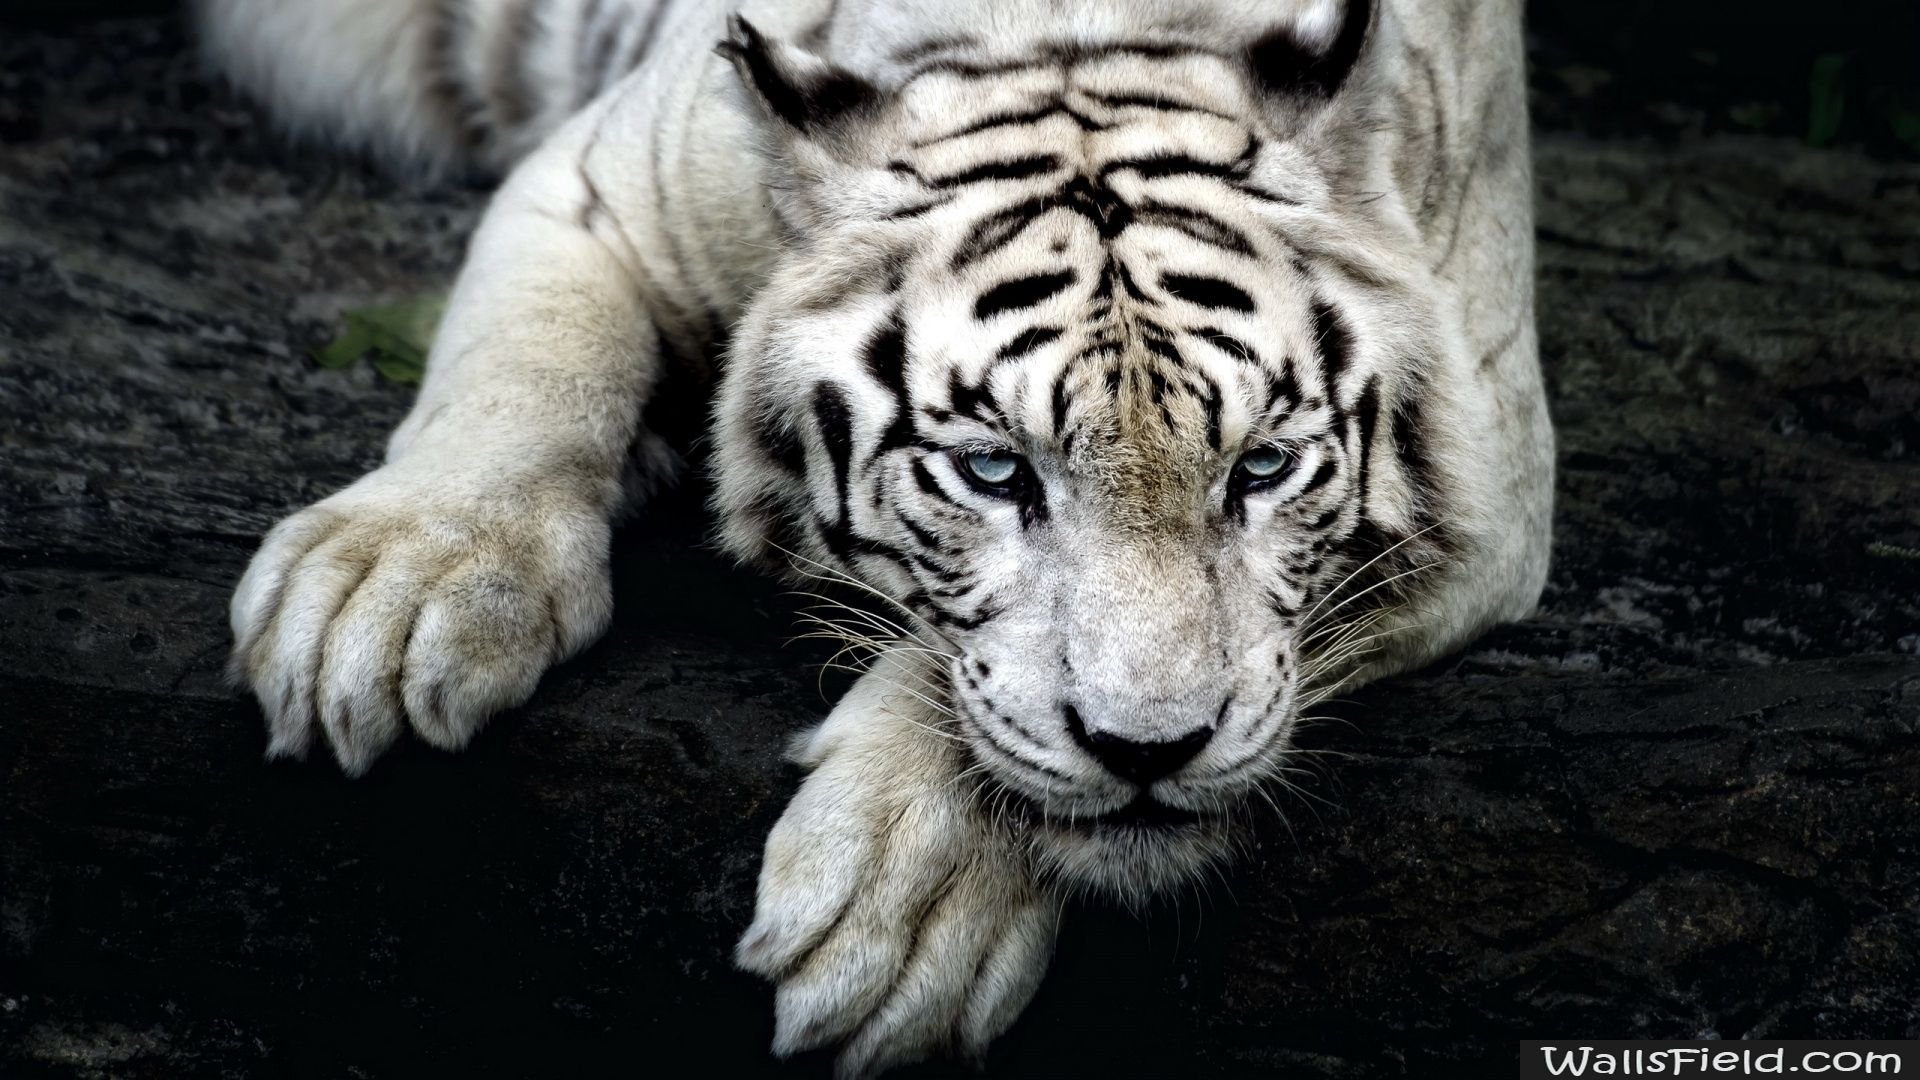 White Tiger Wallsfield Com Free Hd Wallpapers Tiger Wallpaper Iphone Tiger Wallpaper Pet Tiger